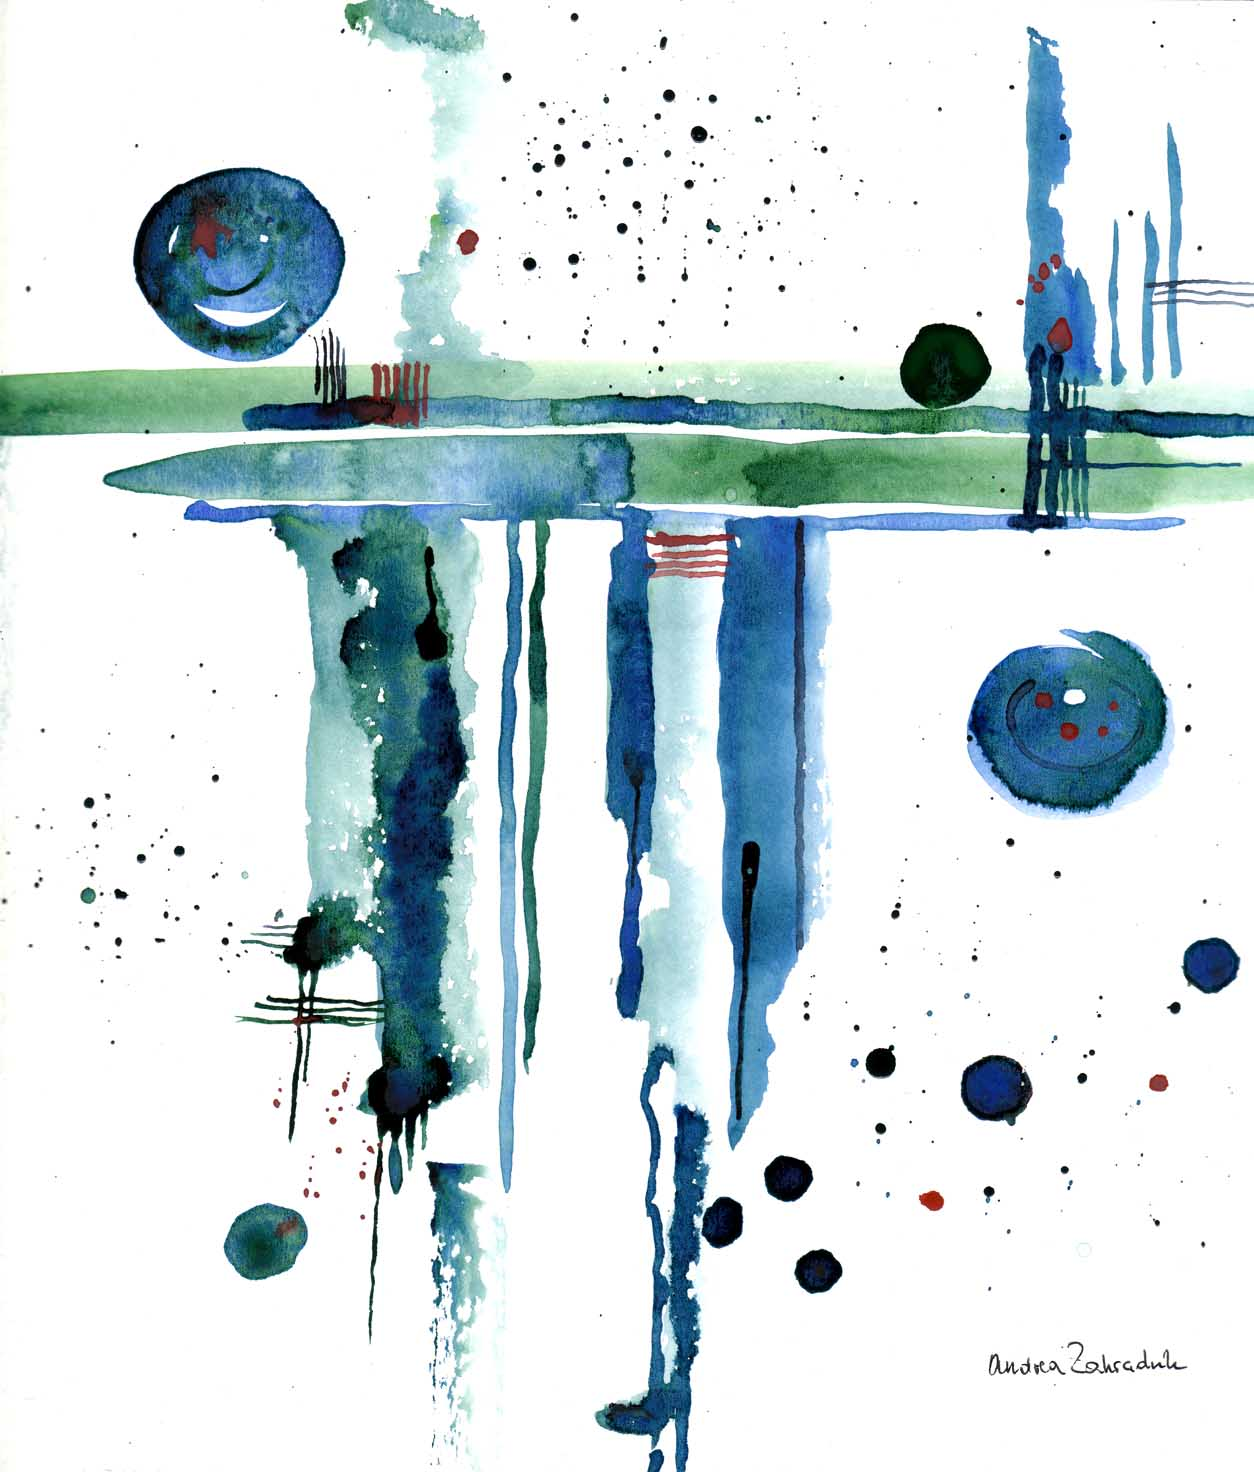 Abstrakt Malerei Abstrakt Von Andrea Zahradnik Bei Kunstnet